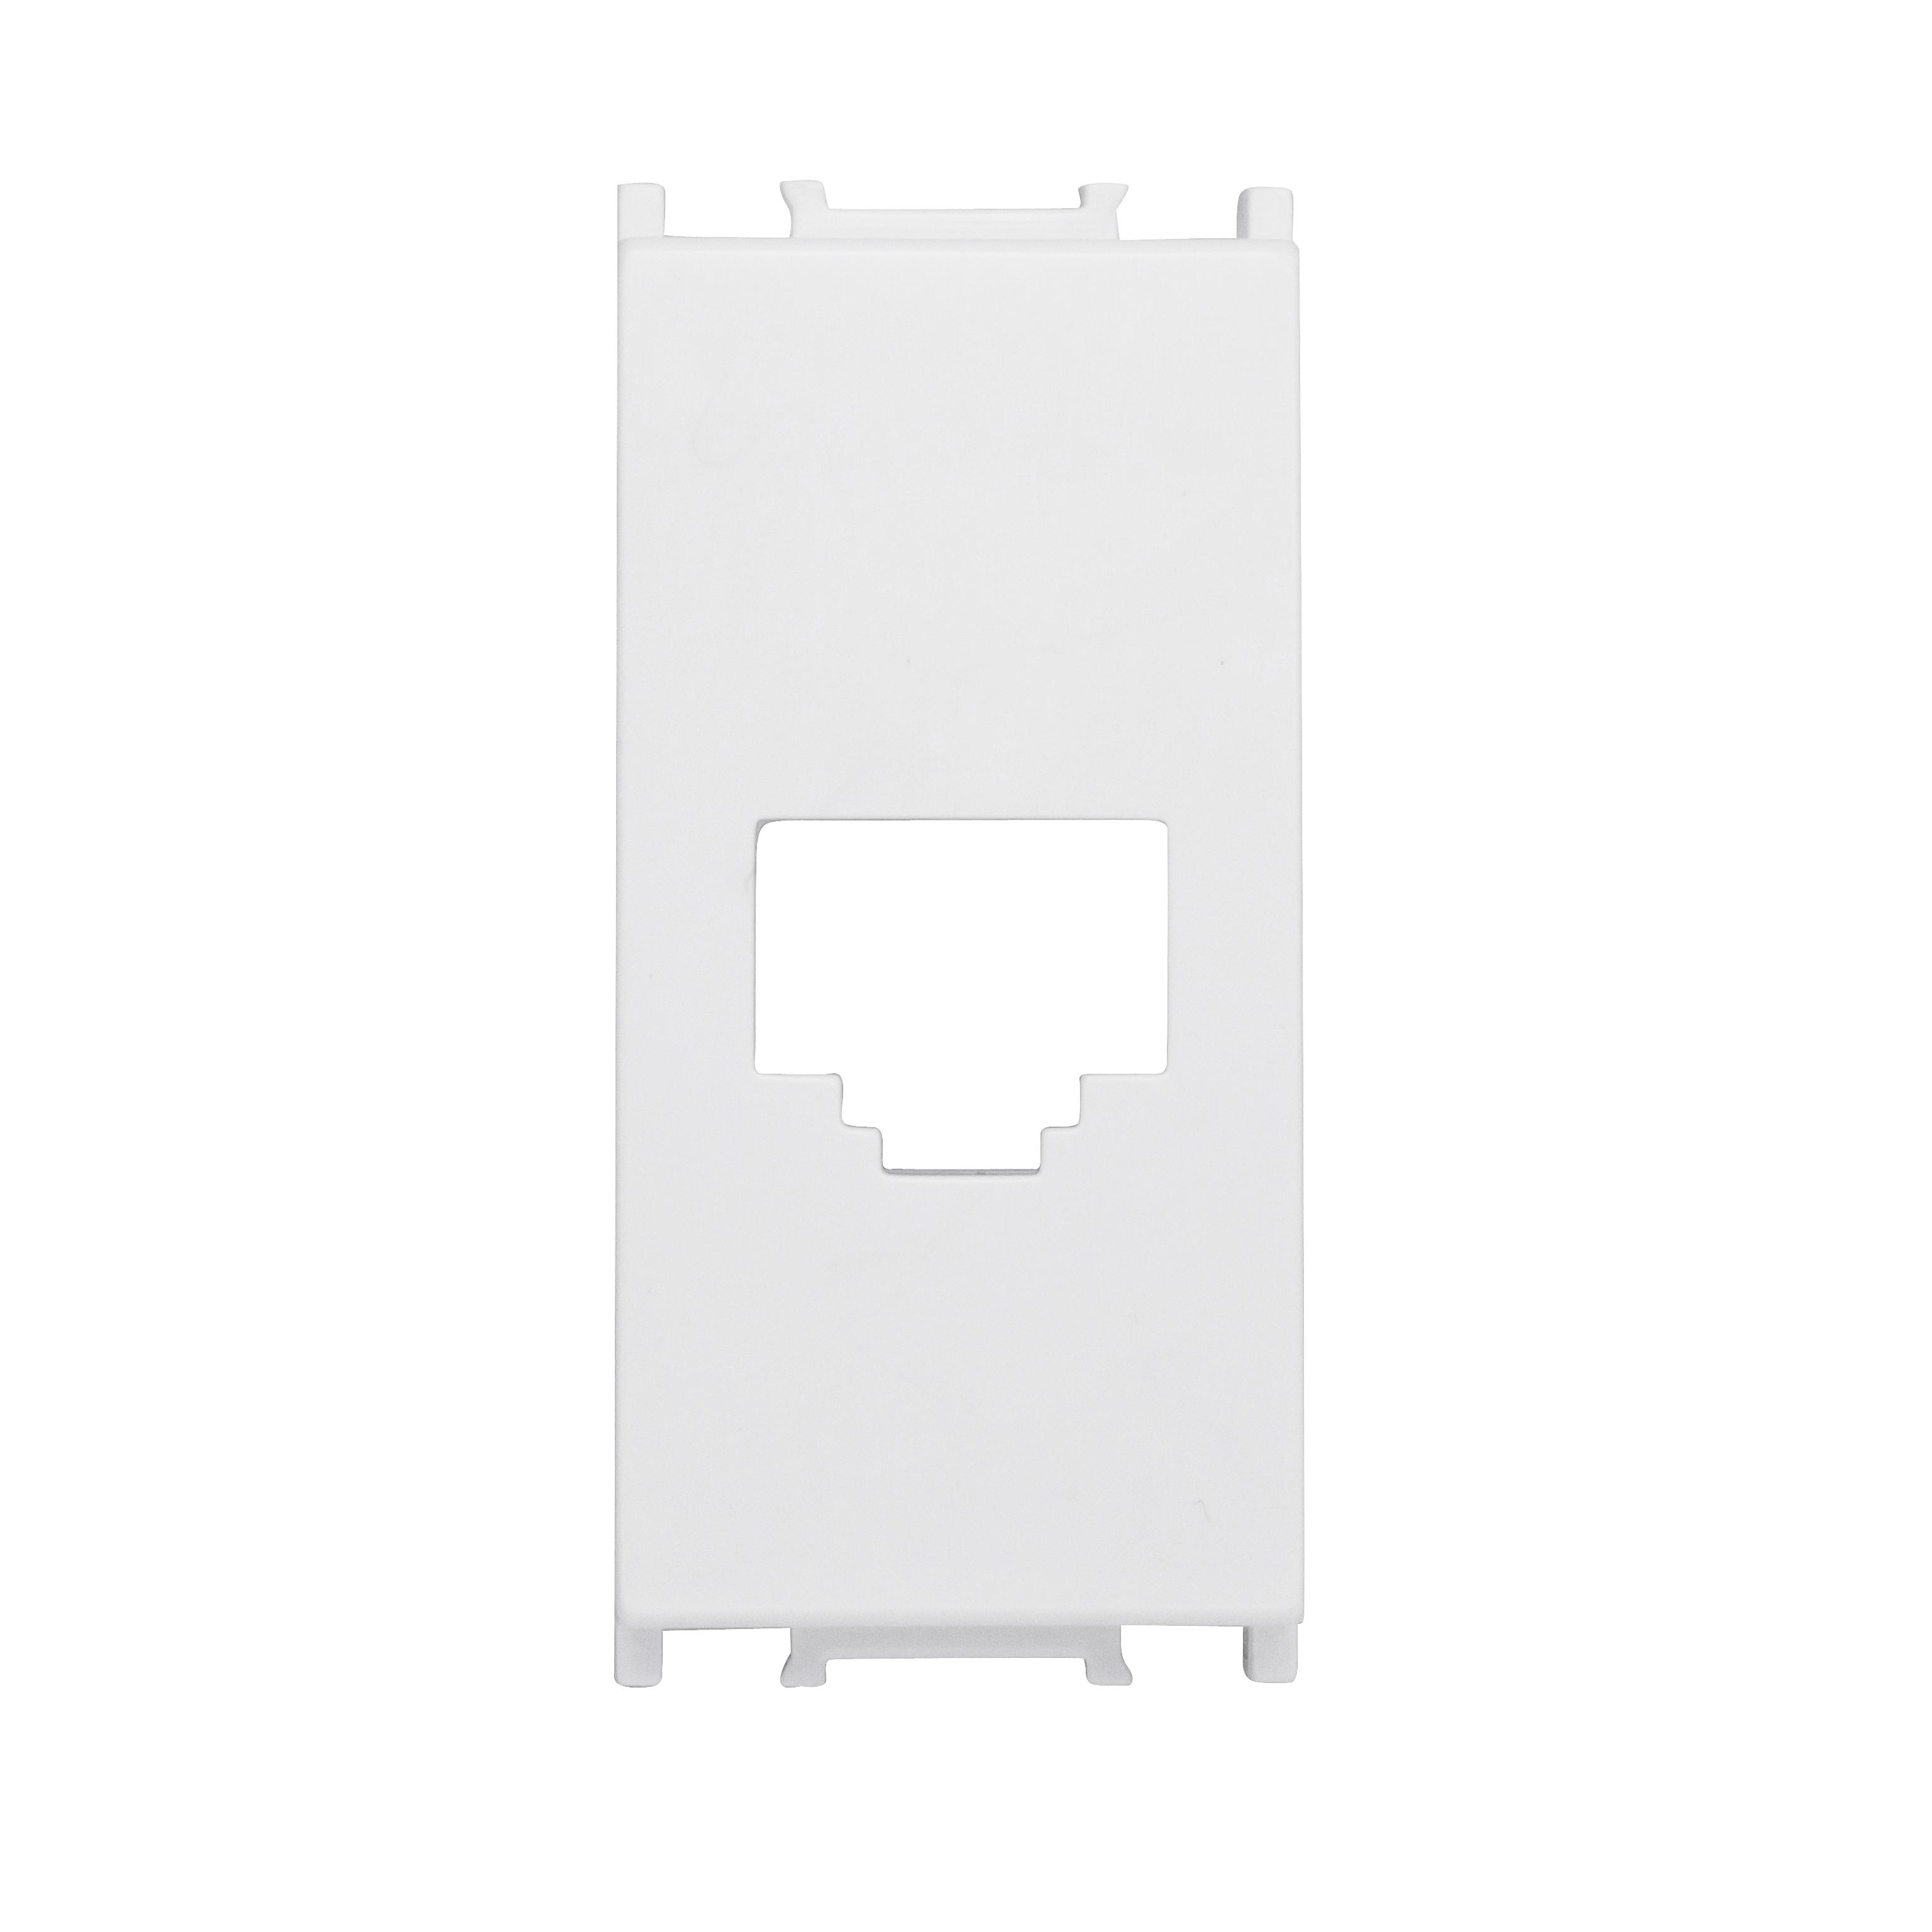 1 Stk Abdeckung RJ45 Toolless Line jack, 1M, weiß ET102017--